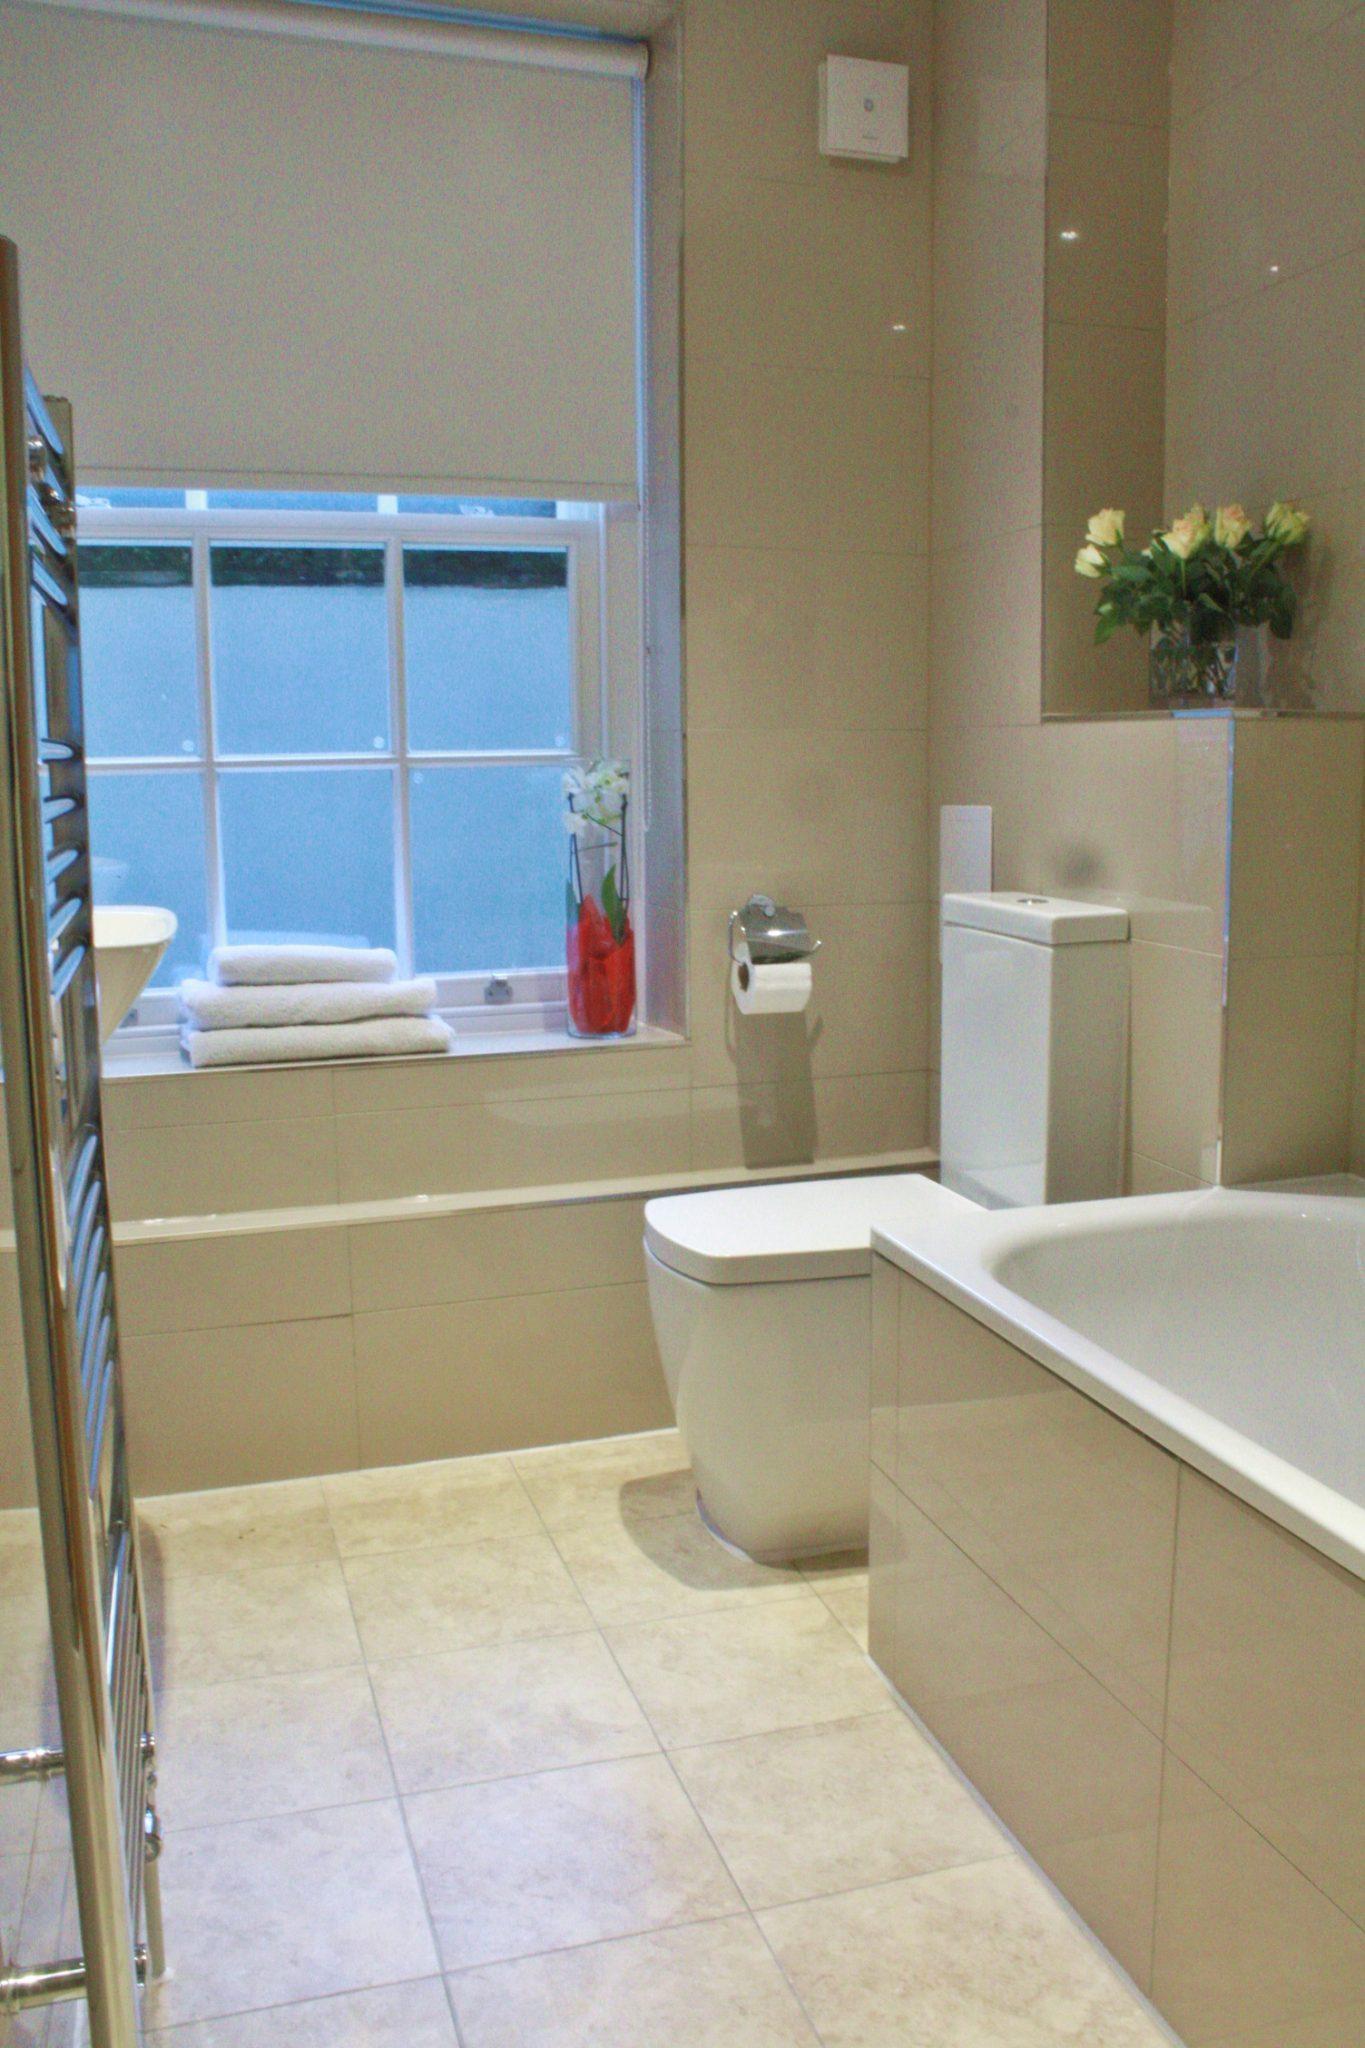 Liverpool Street Serviced Accommodation Artillery Lane Apartments Bathroom